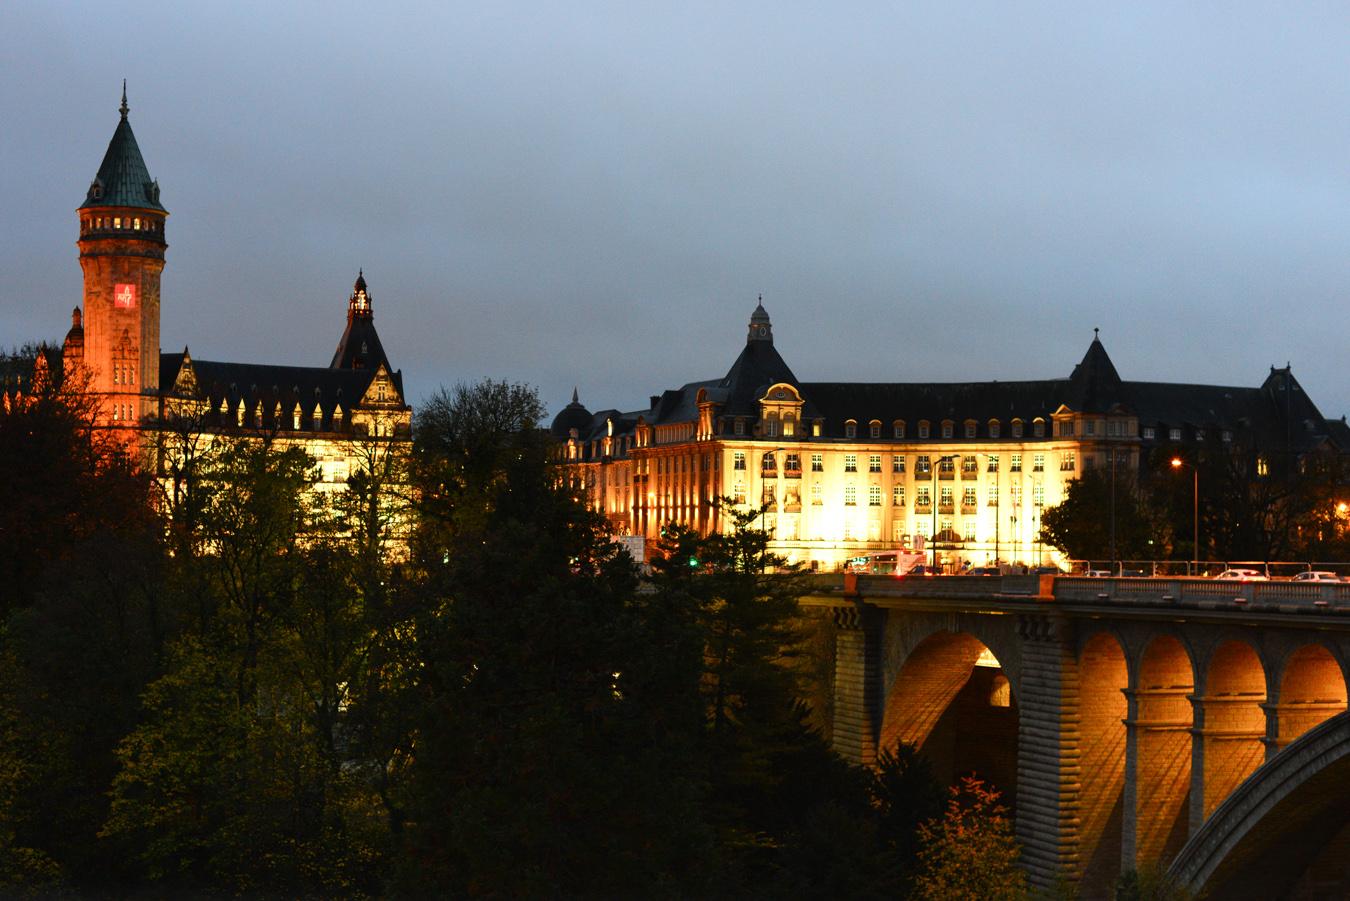 Luxembourg (1) - Luxemburg City at night